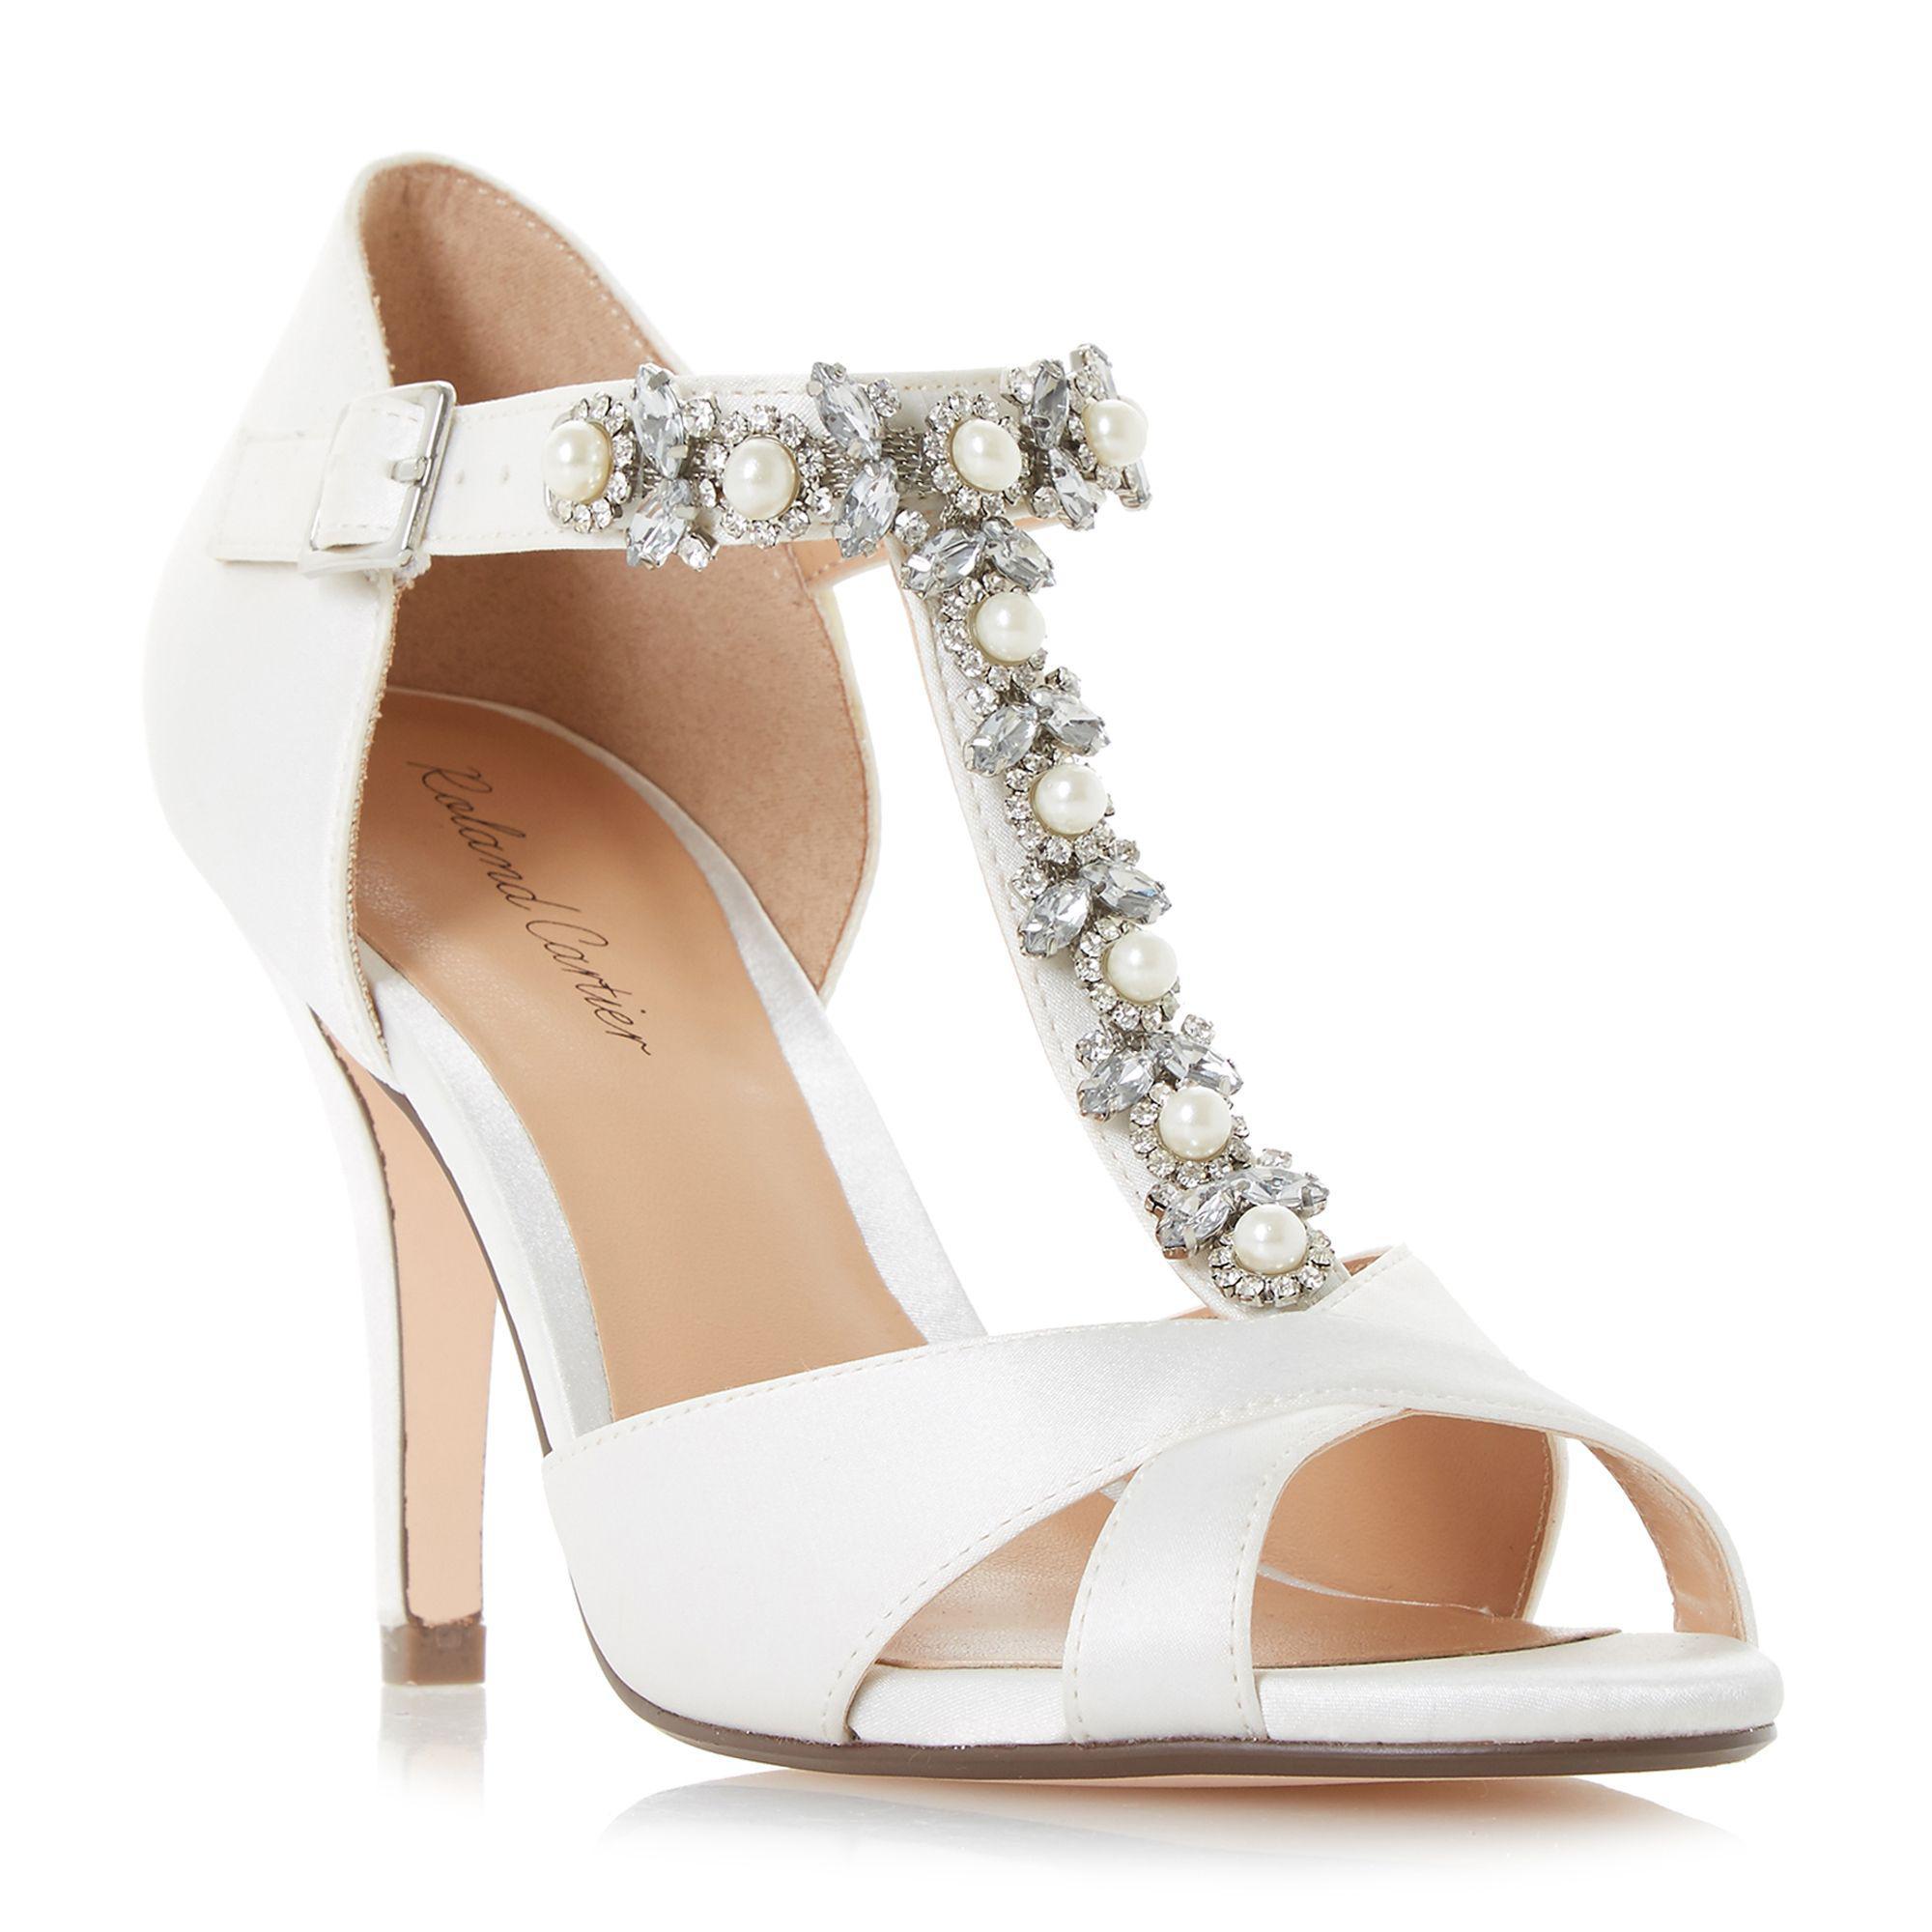 339ba5458ff Roland Cartier Ivory Satin  maddalyn  High Stiletto Heel Court Shoes ...